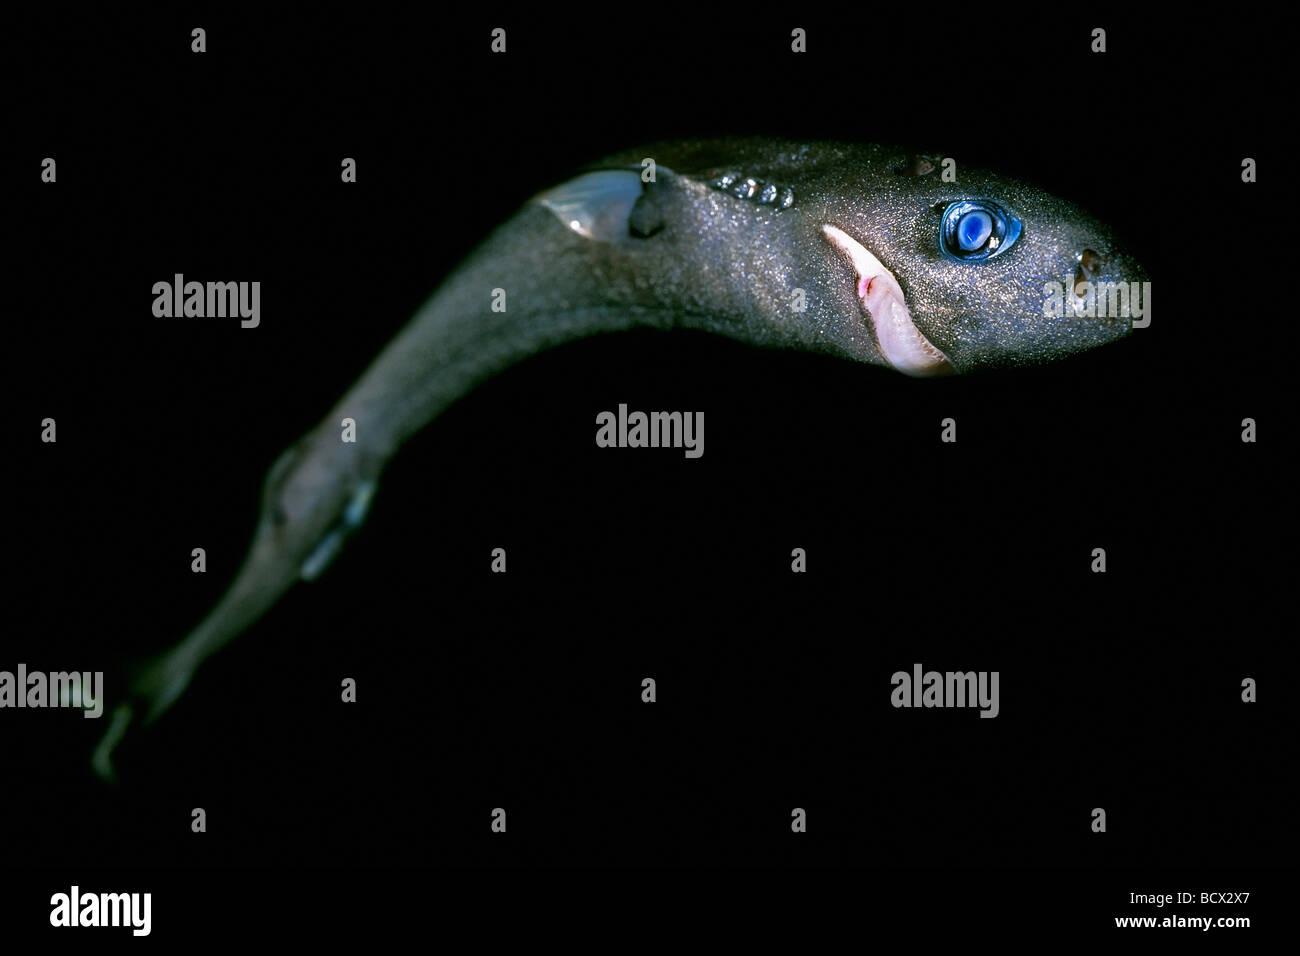 Deep sea fish stock photos deep sea fish stock images for Deep sea fish